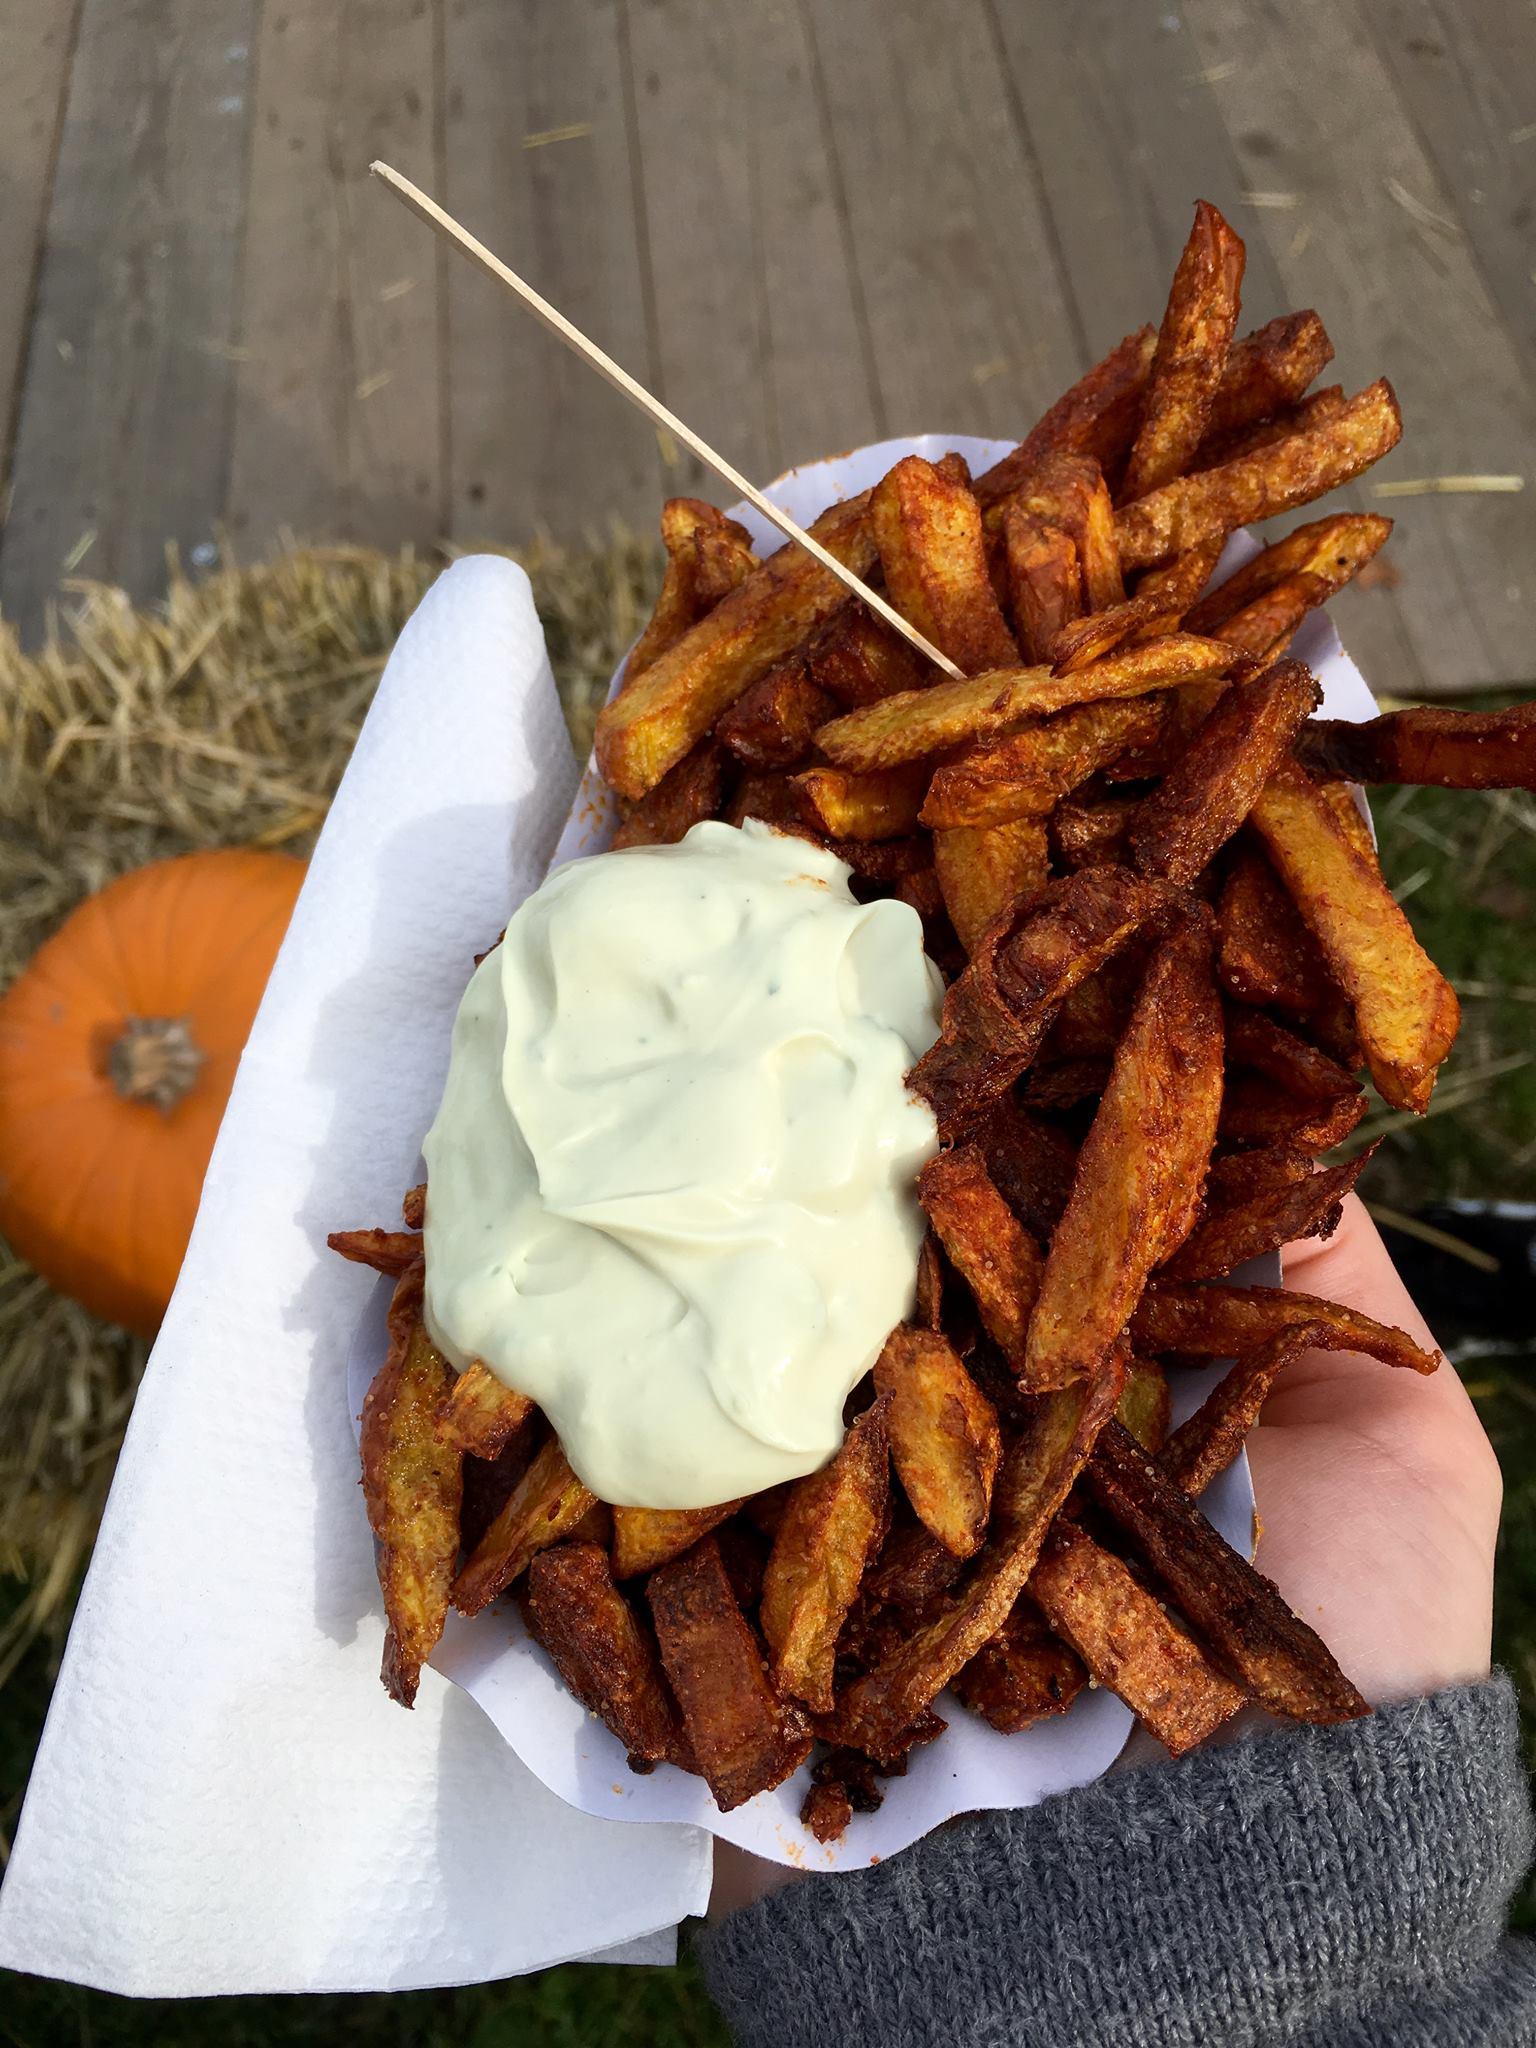 Pumpkin fries at the Ludwigsburg Pumpkin Festival